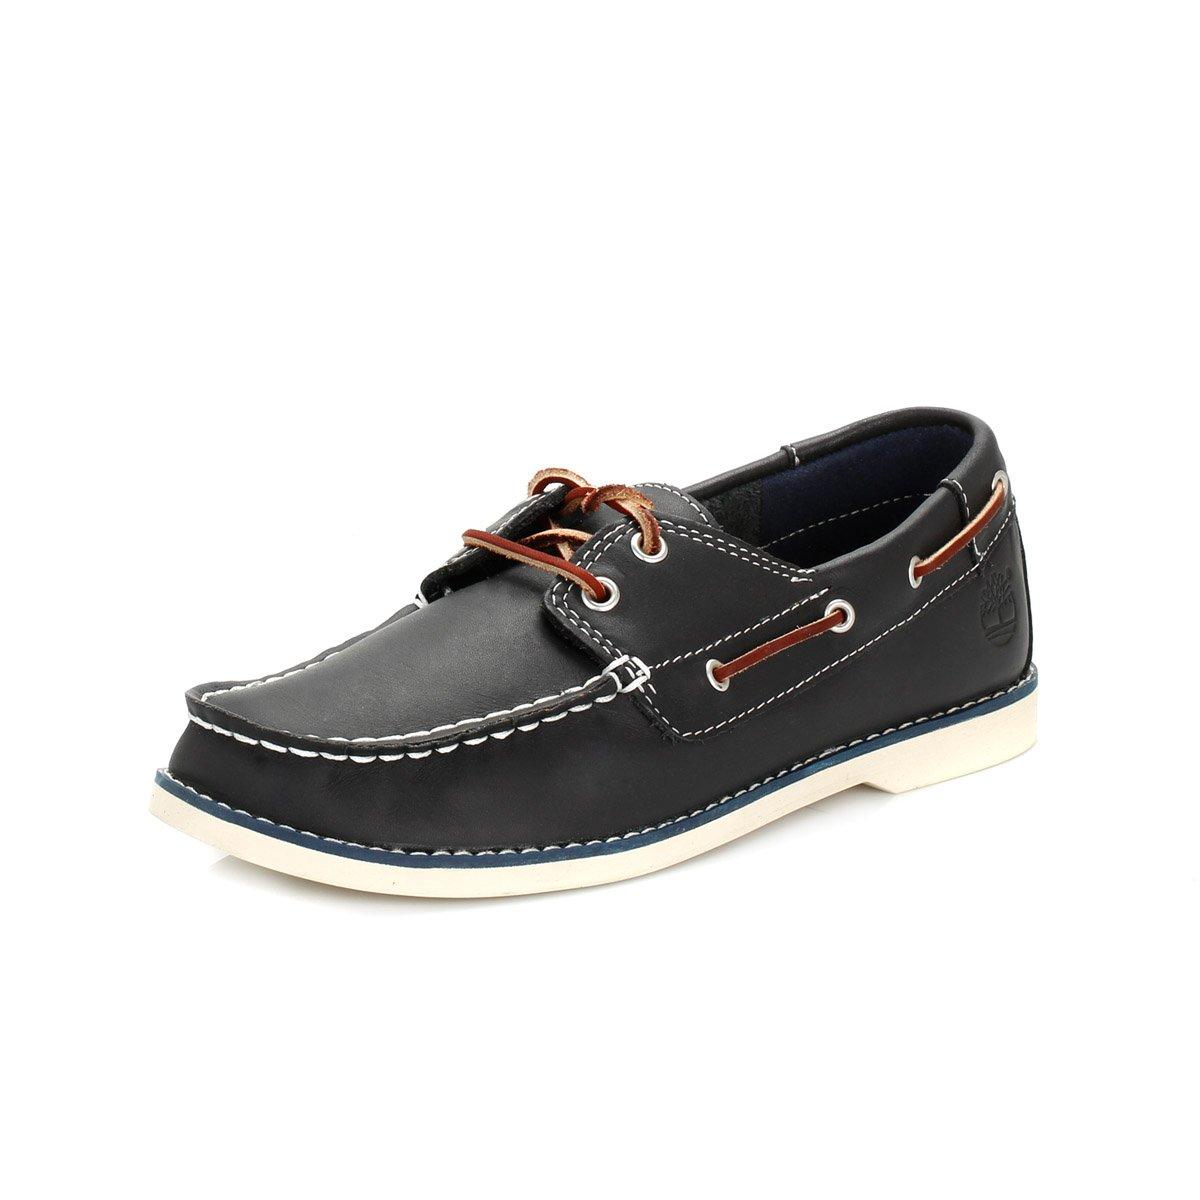 Timberland Seabury Classic 2 Eye, Chaussures Bateau Mixte Enfant TB03197A